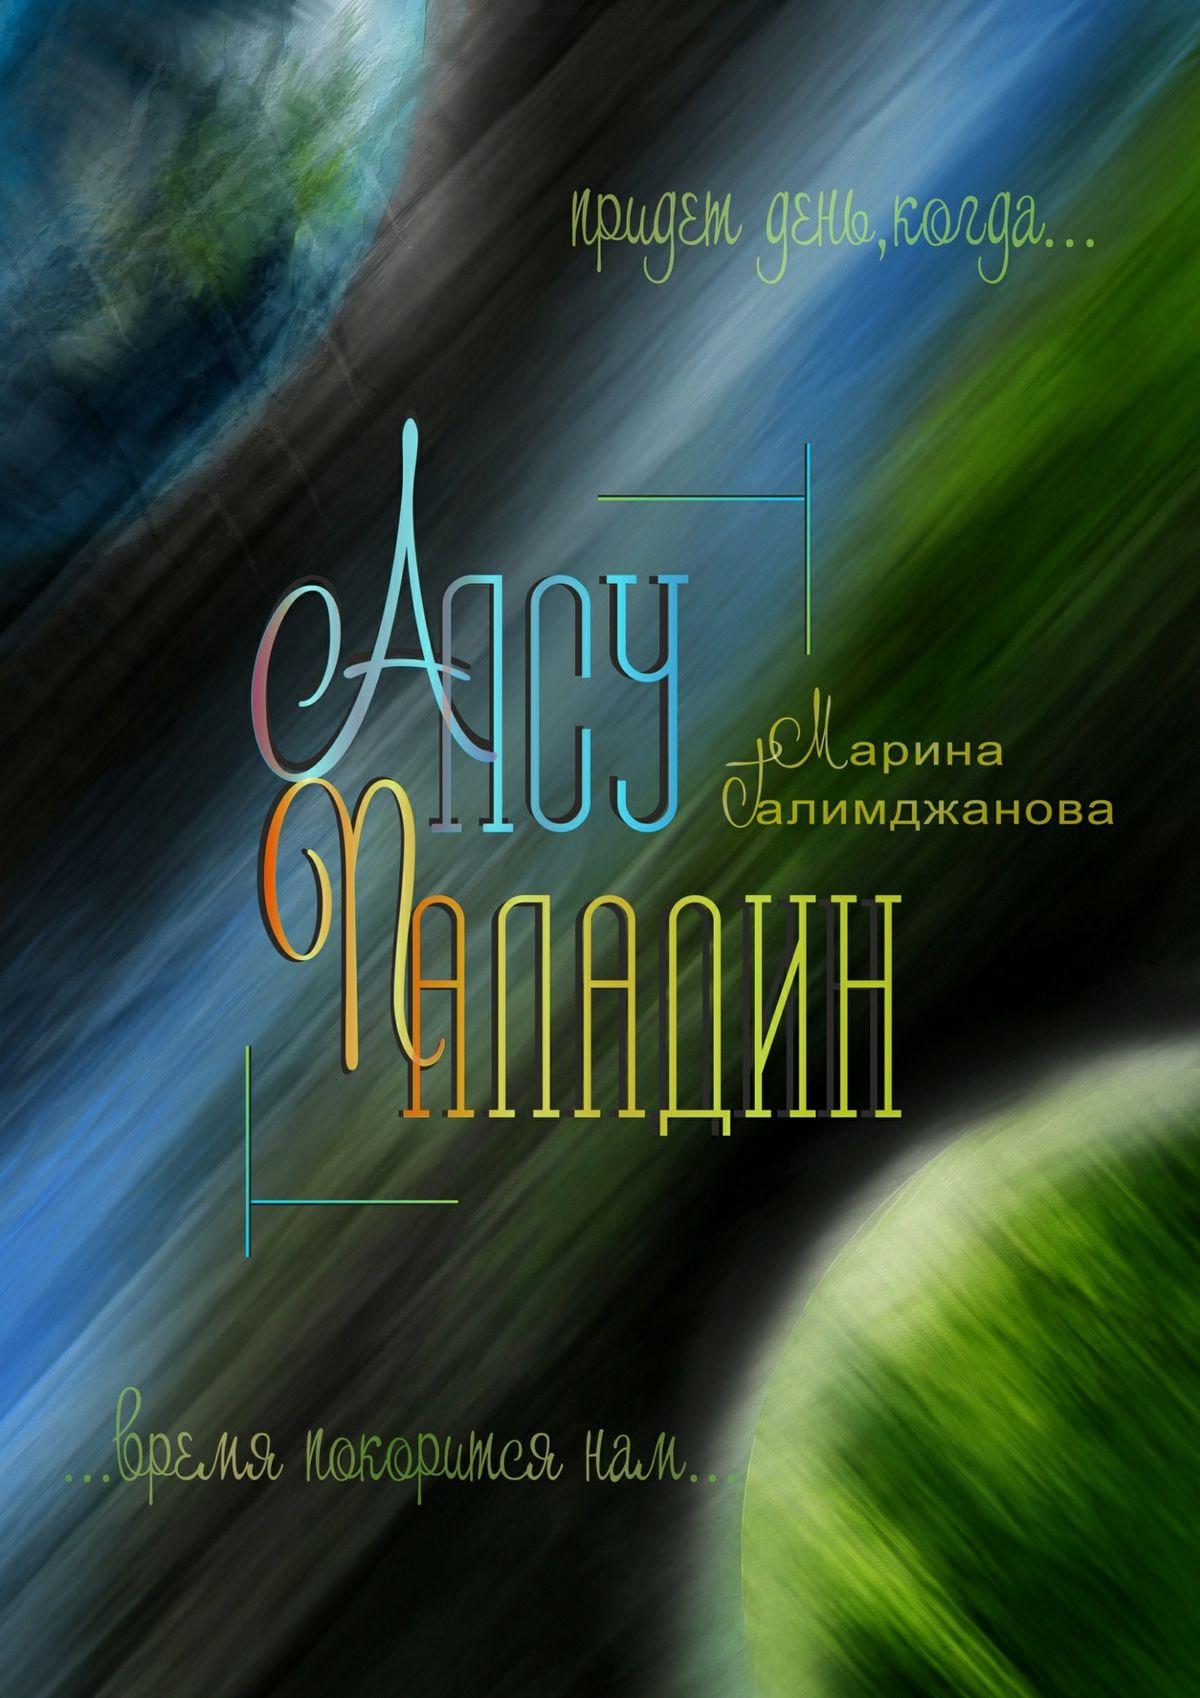 Марина Галимджанова Алсу Паладин ануар алимжанов гонец